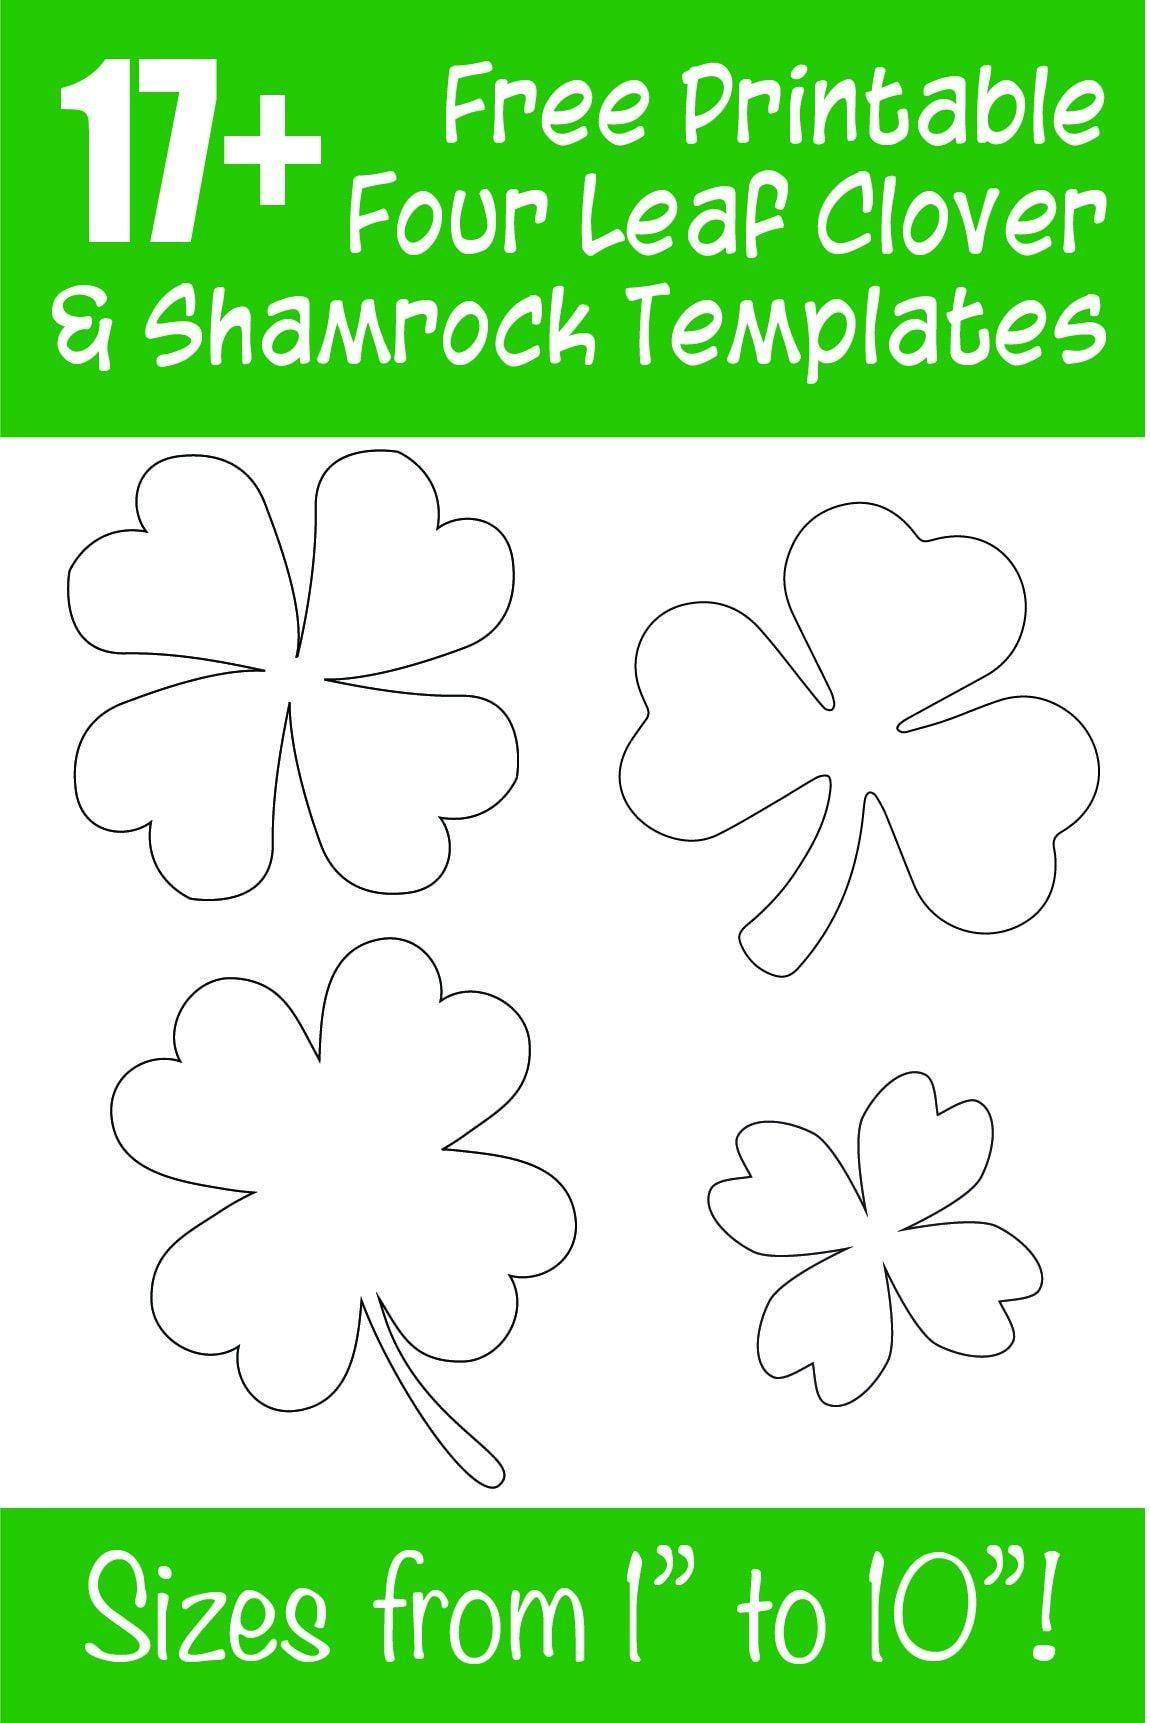 15 Free Printable Four Leaf Clover Shamrock Templates